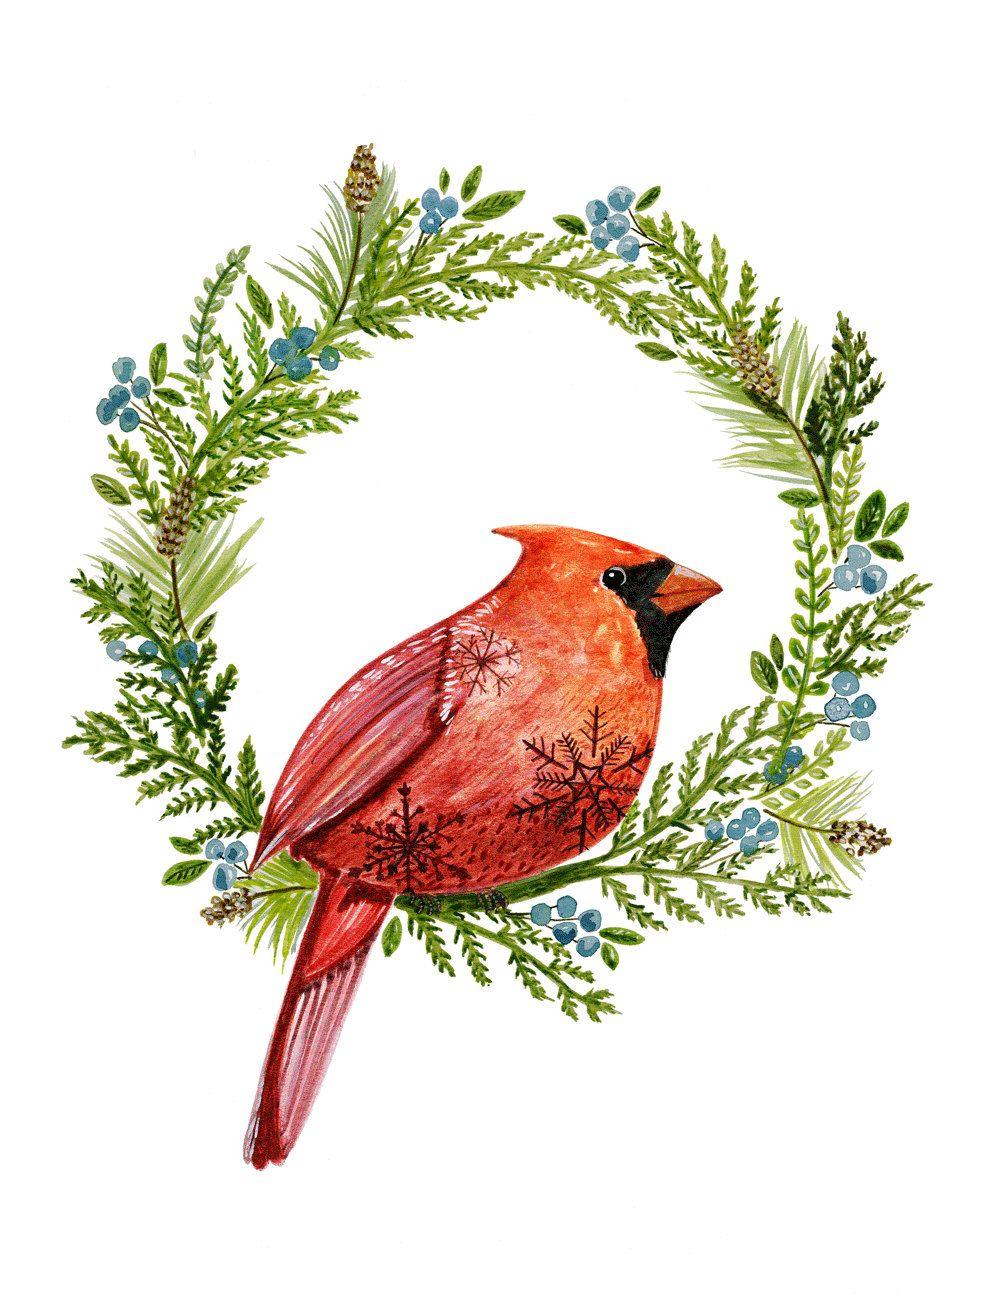 Cardinal Art Print, Bird Art, Floral Art, Woodland Art, Watercolor, Illustration by LindsayBrackeen on Etsy https://www.etsy.com/listing/259572527/cardinal-art-print-bird-art-floral-art